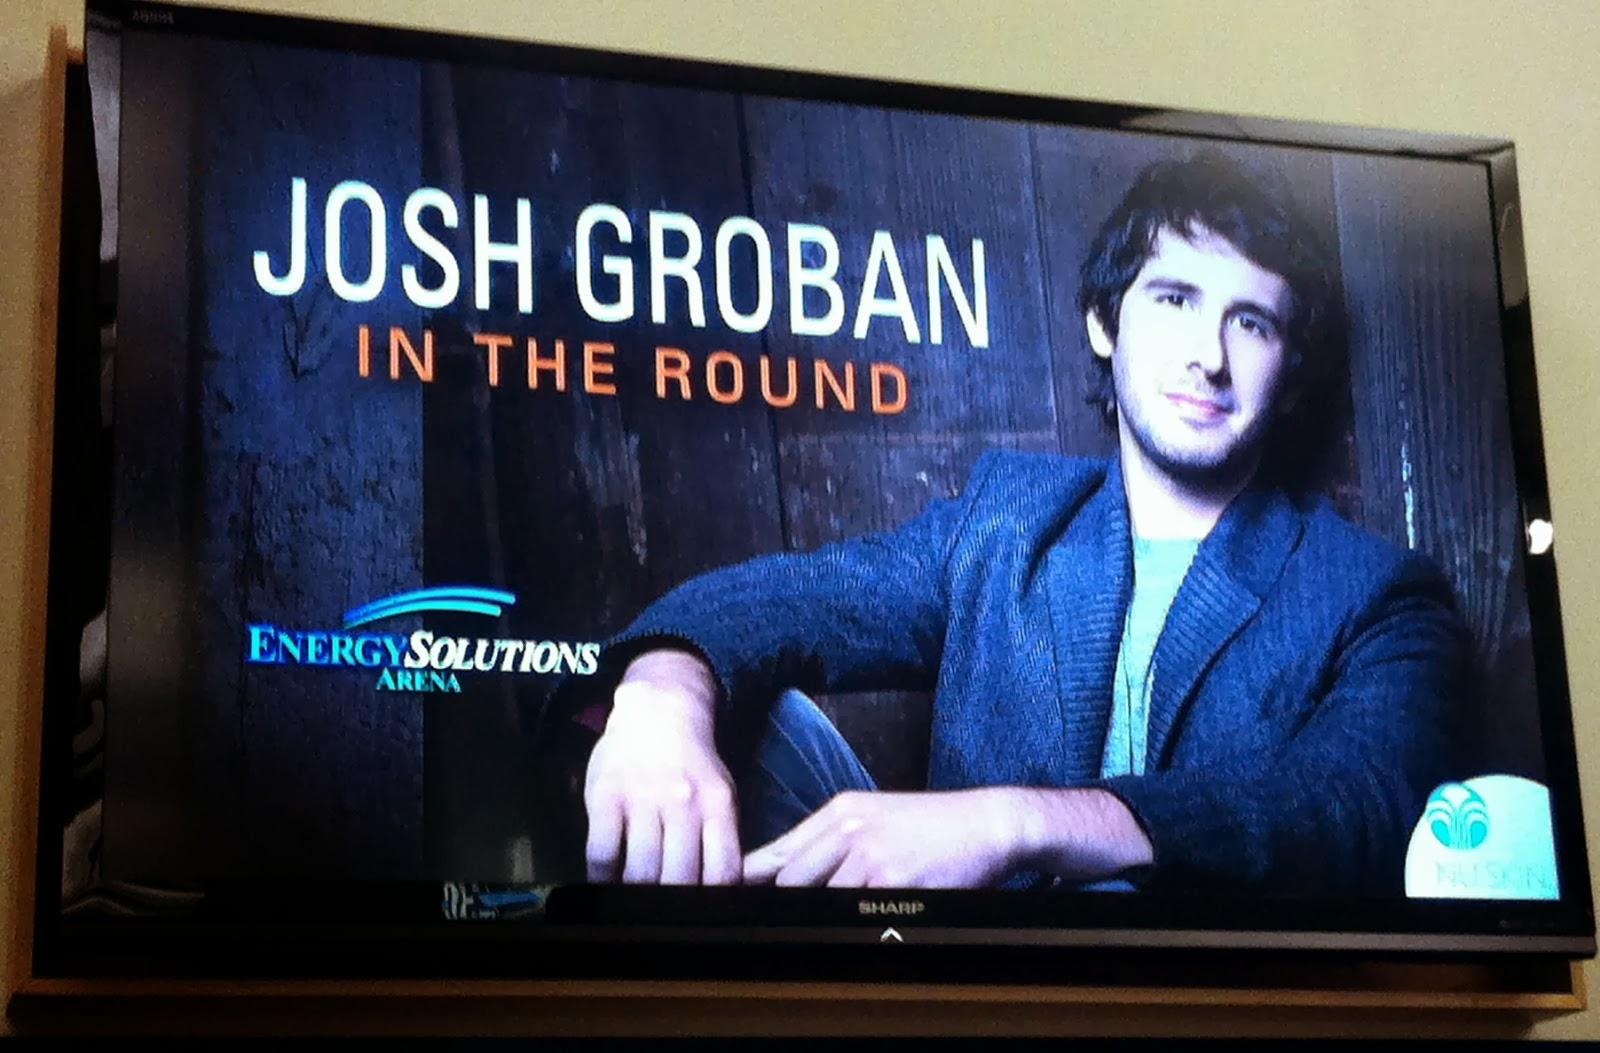 Josh Groban Christmas Albums - Josh Groban – Stages | Album review ...